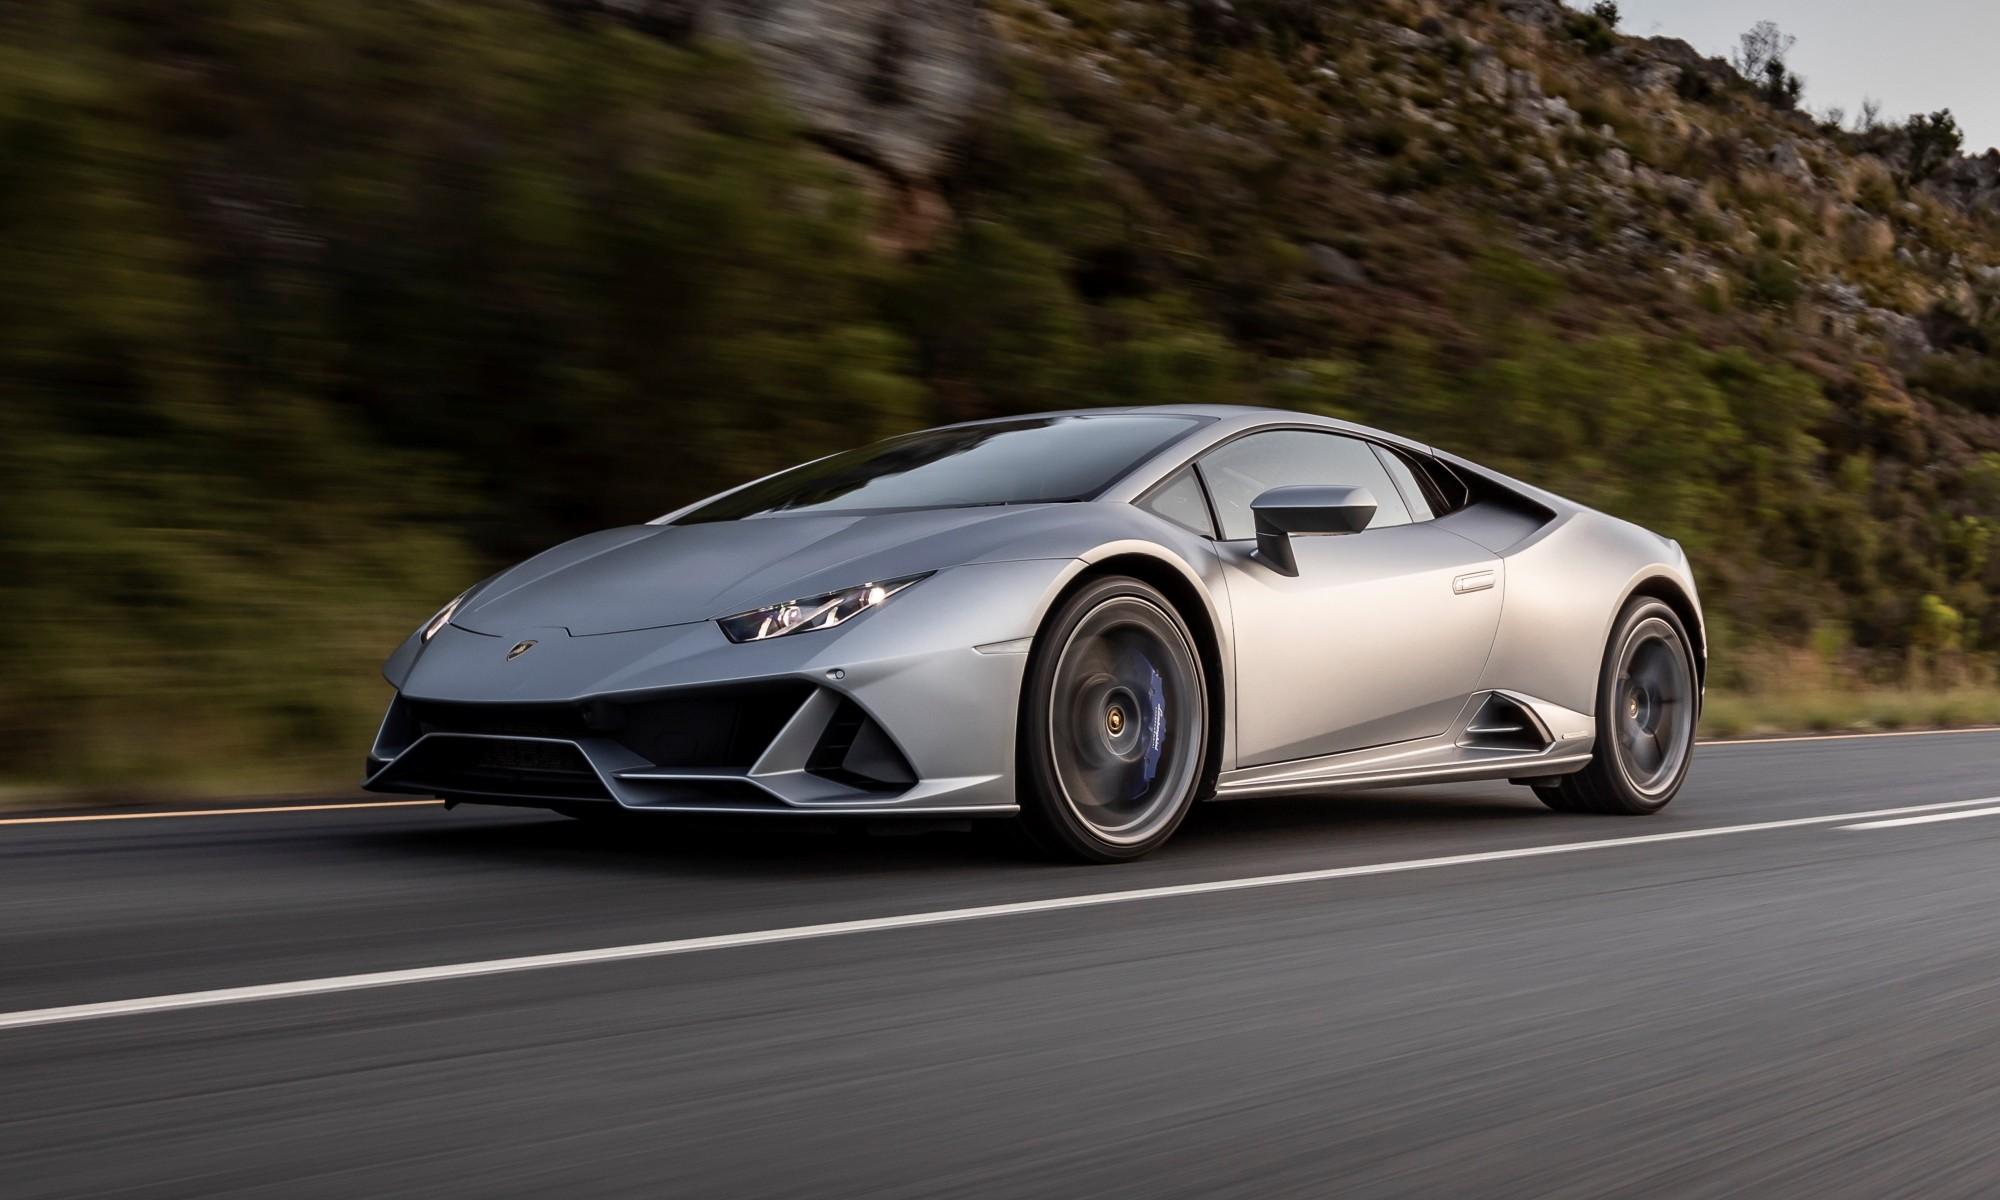 Lamborghini Huracan Evo driven